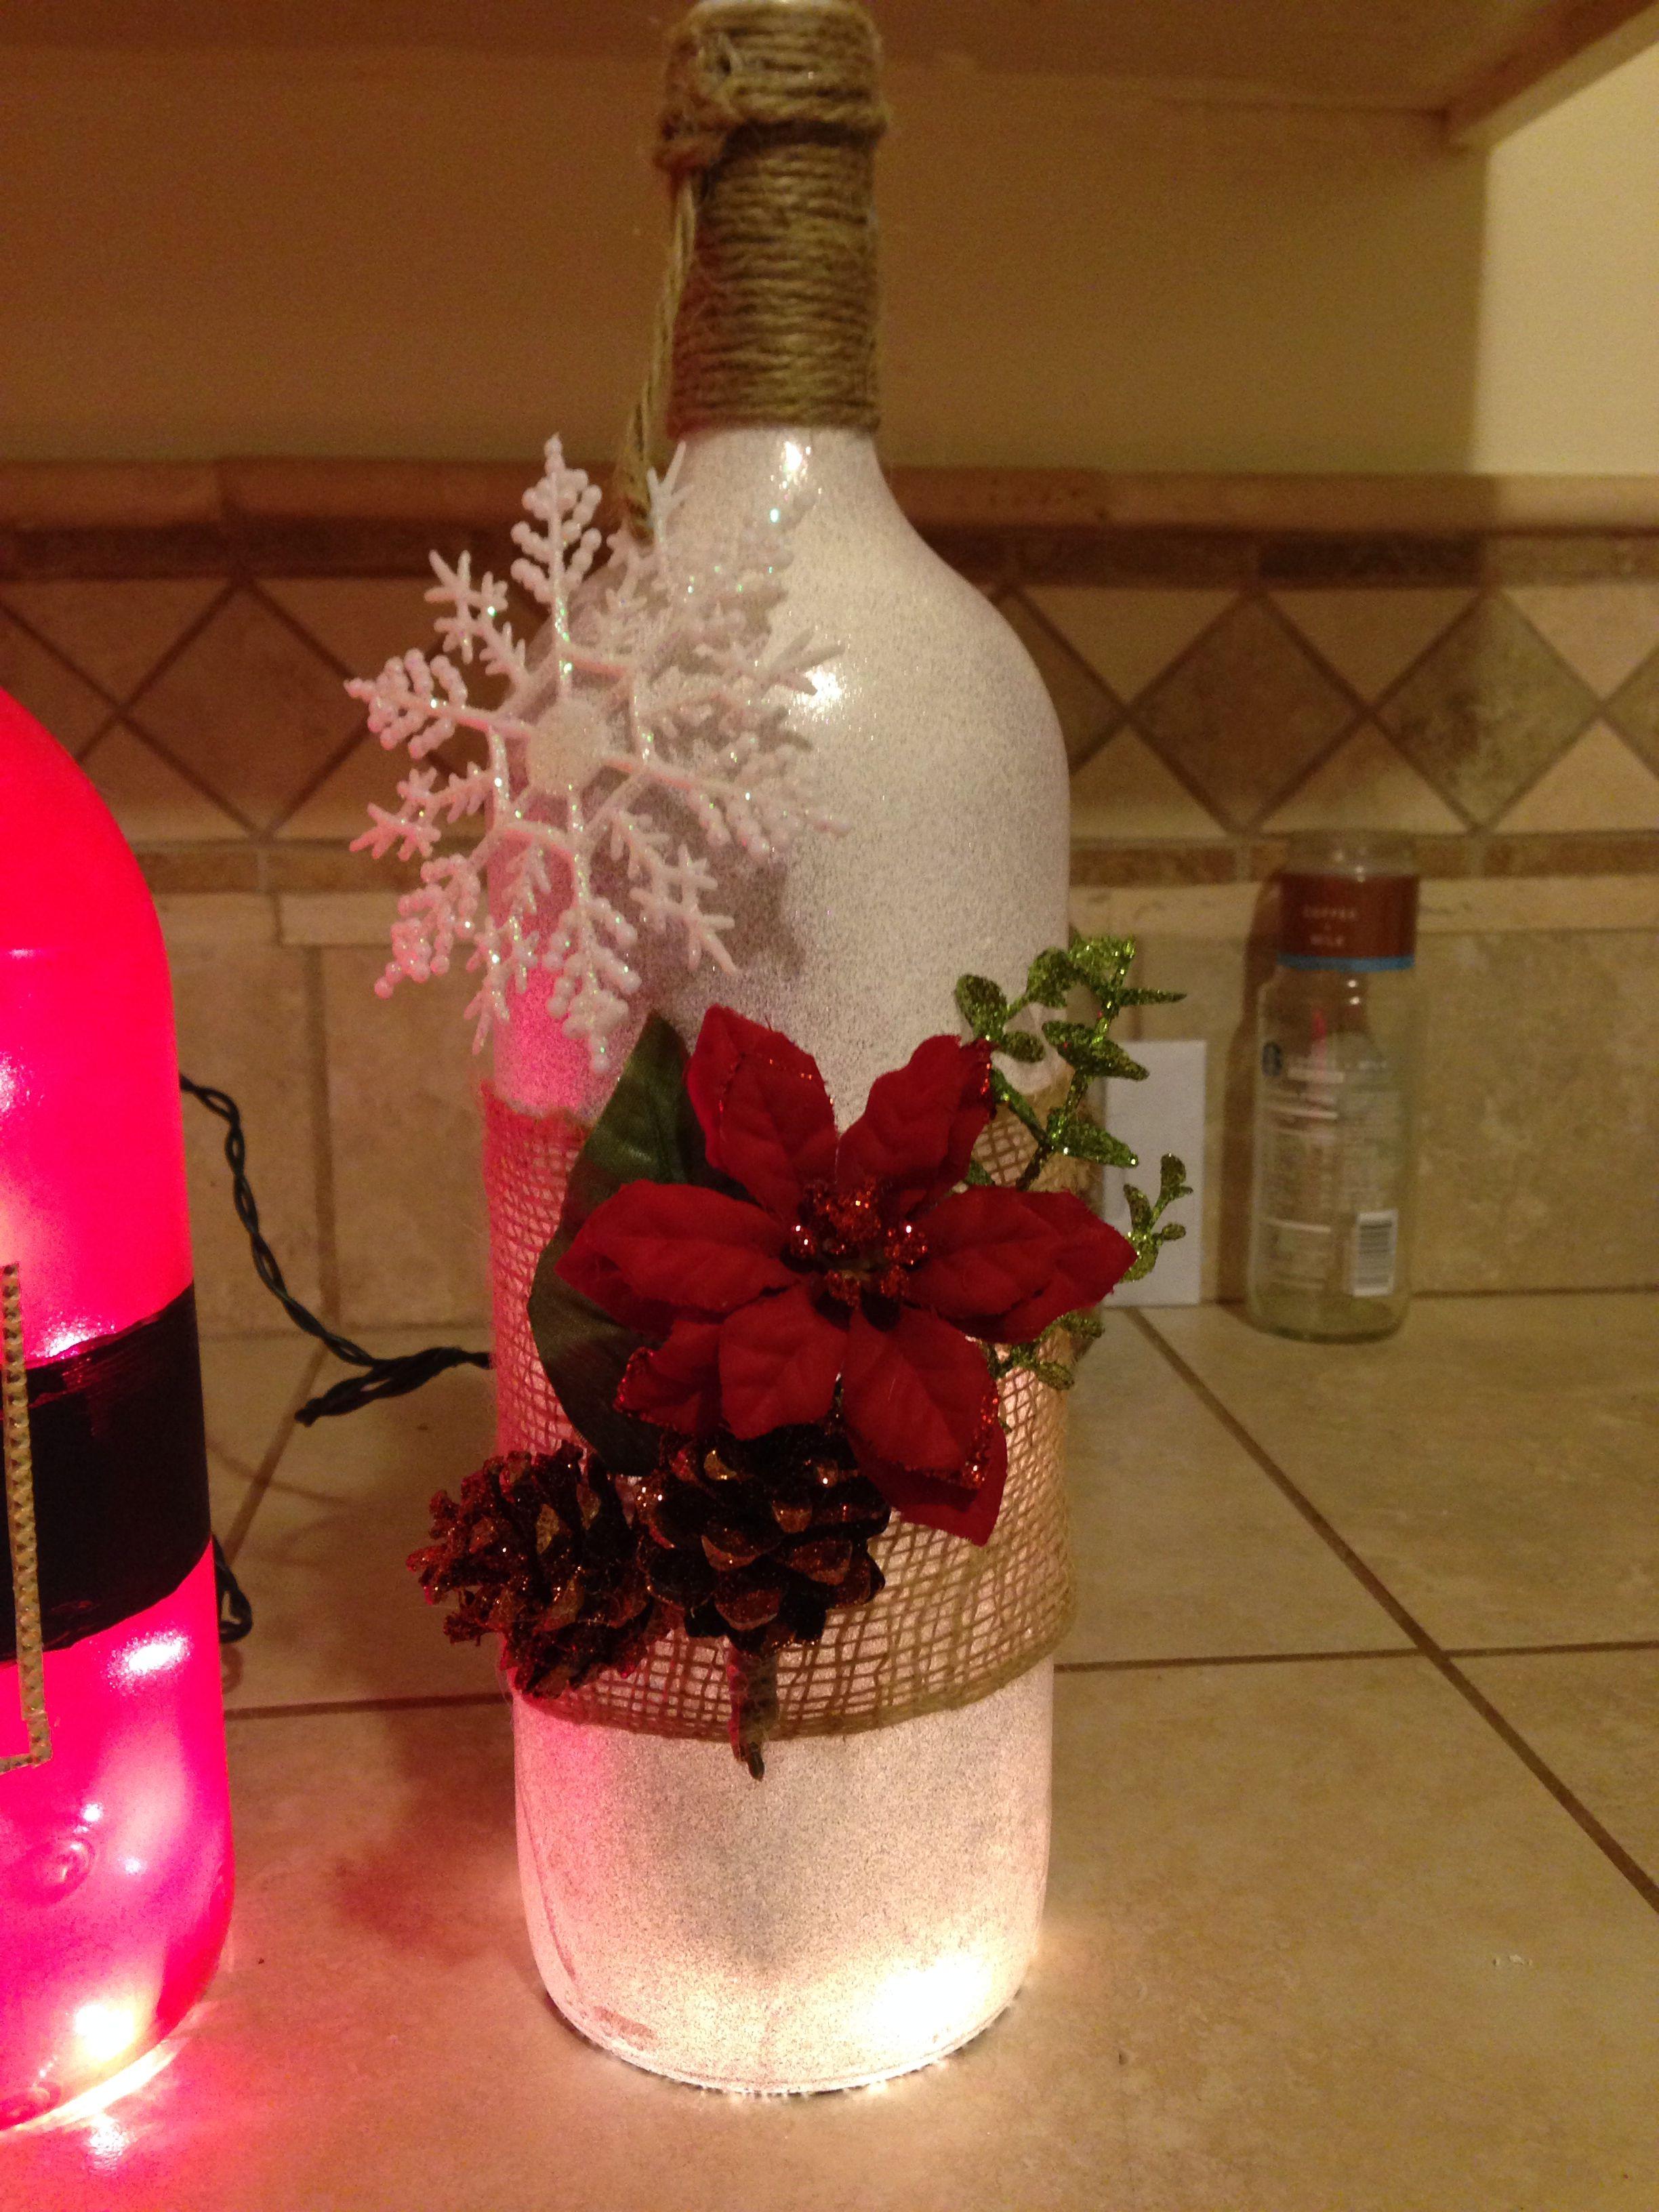 Christmas Lighted Wine Bottle Drill Hole With A Dremel Diamond 1 4 Bit Garrafas Decoradas Artesanato Reciclado Trabalhos Manuais